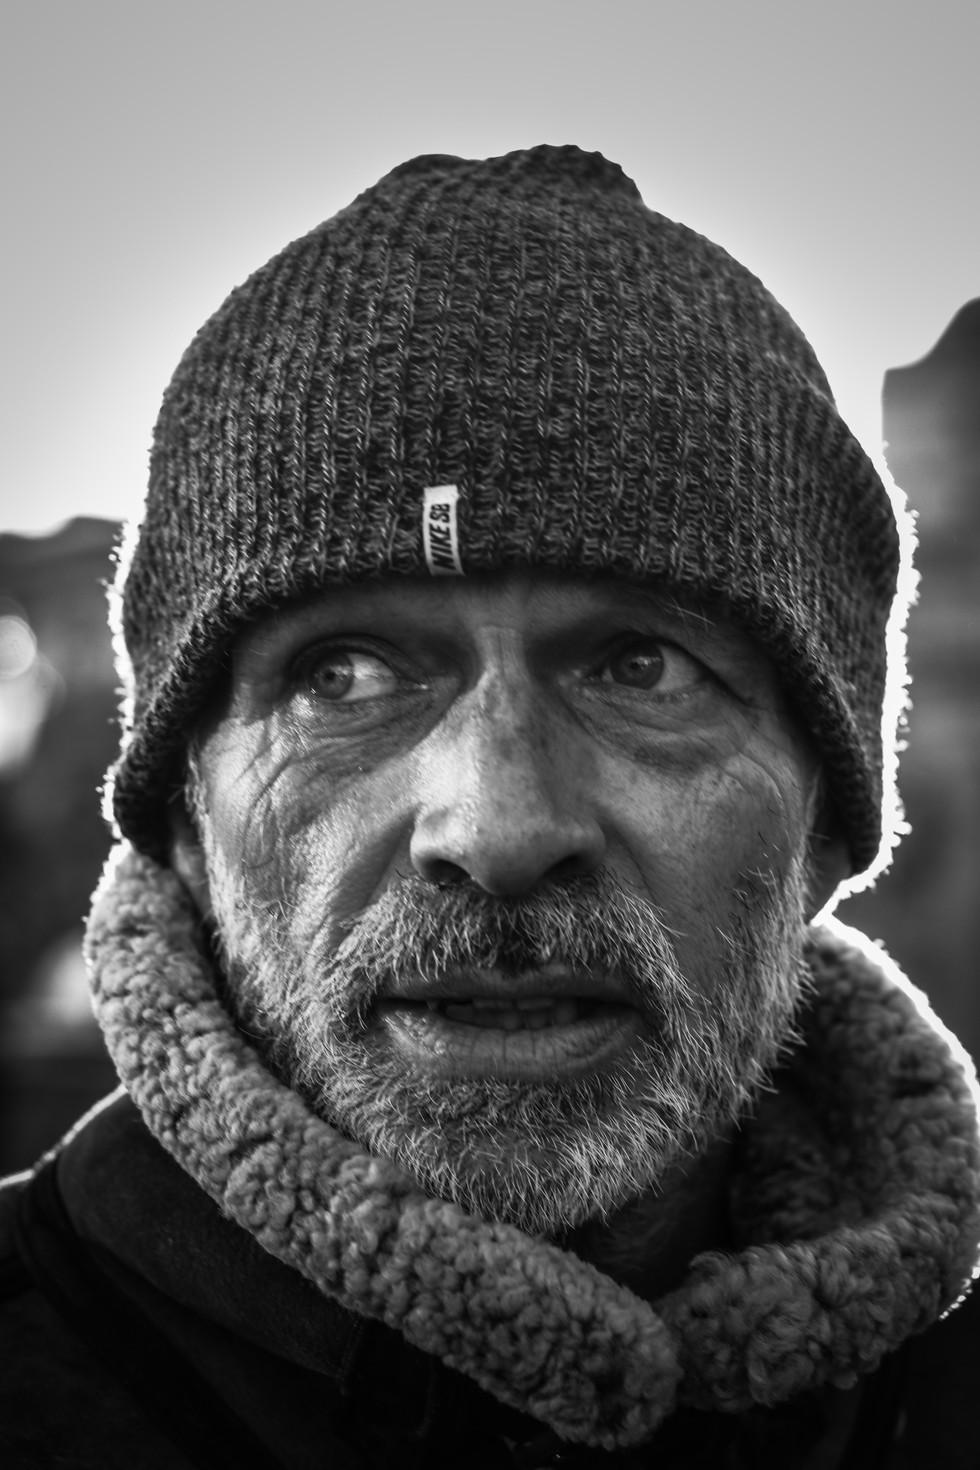 The Homeless Bard